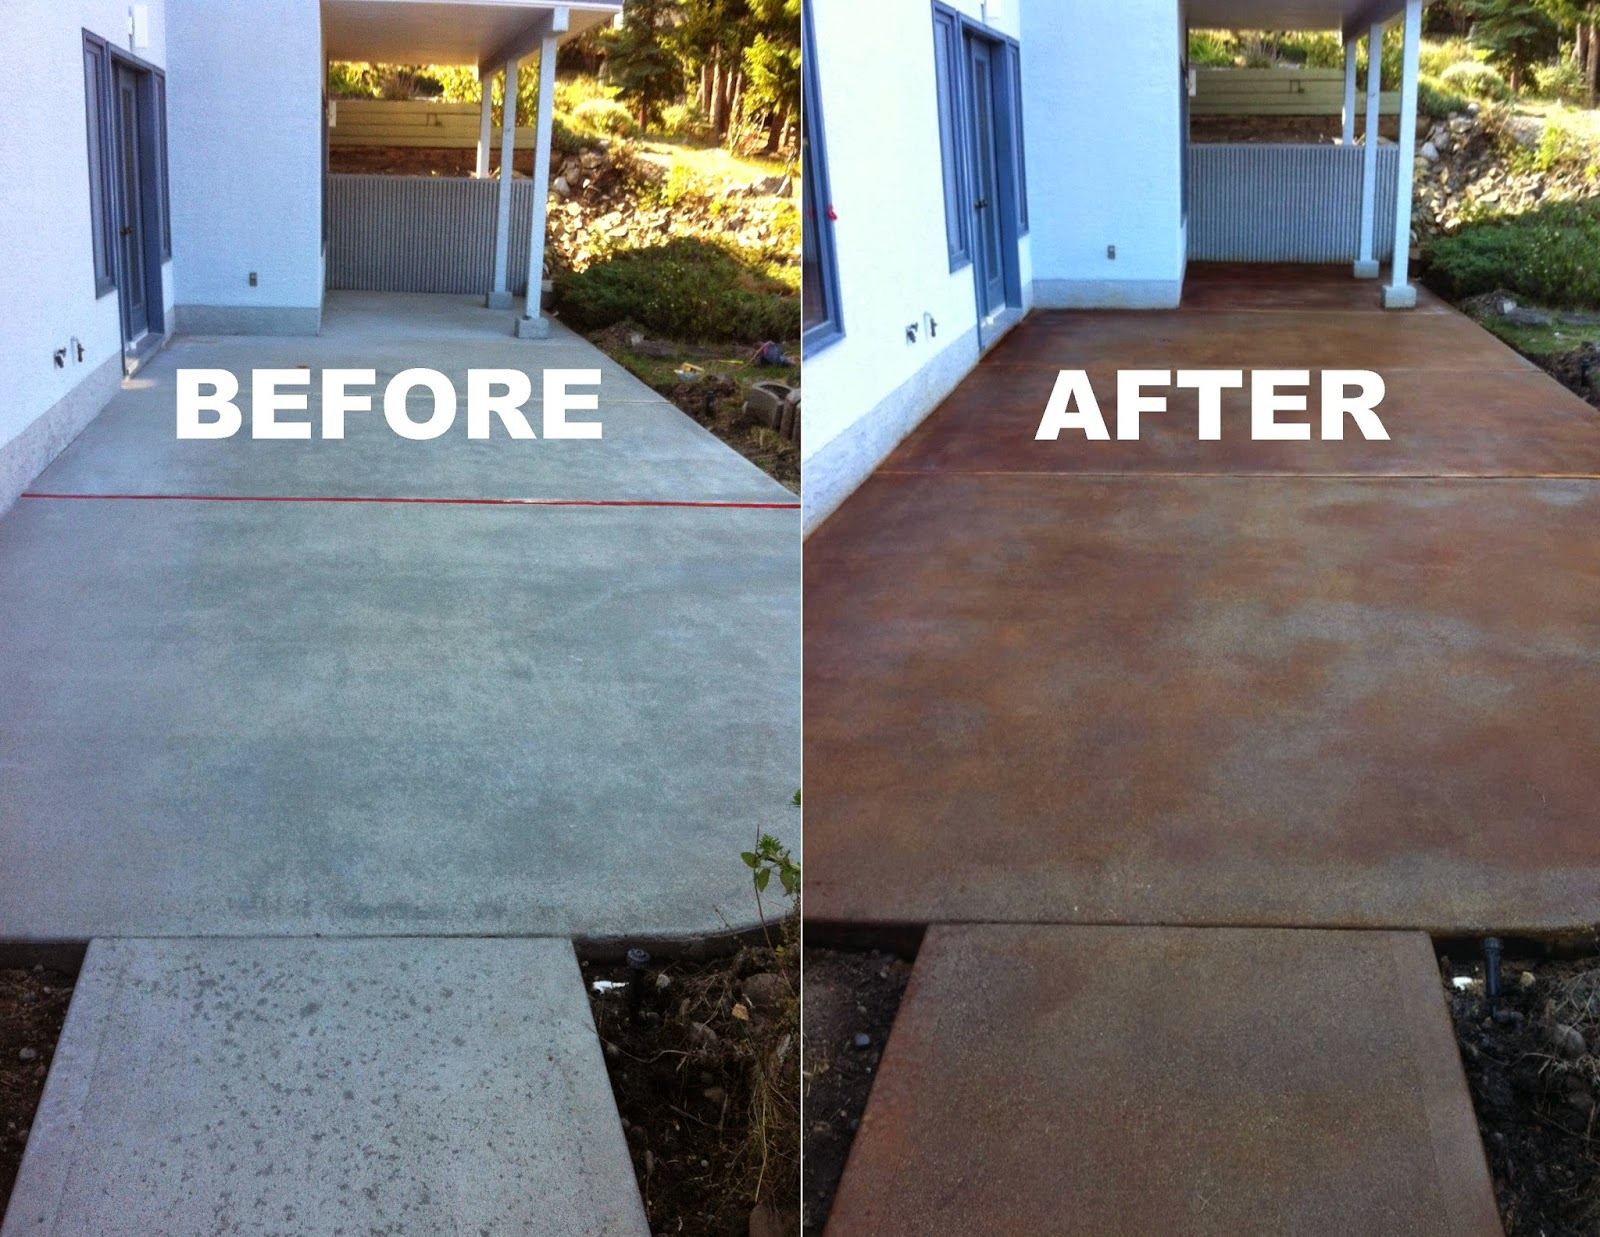 Patio Deck Concrete Staining Adorable Mode Concrete Concrete Maintenance Repair Acidstaining  Pool